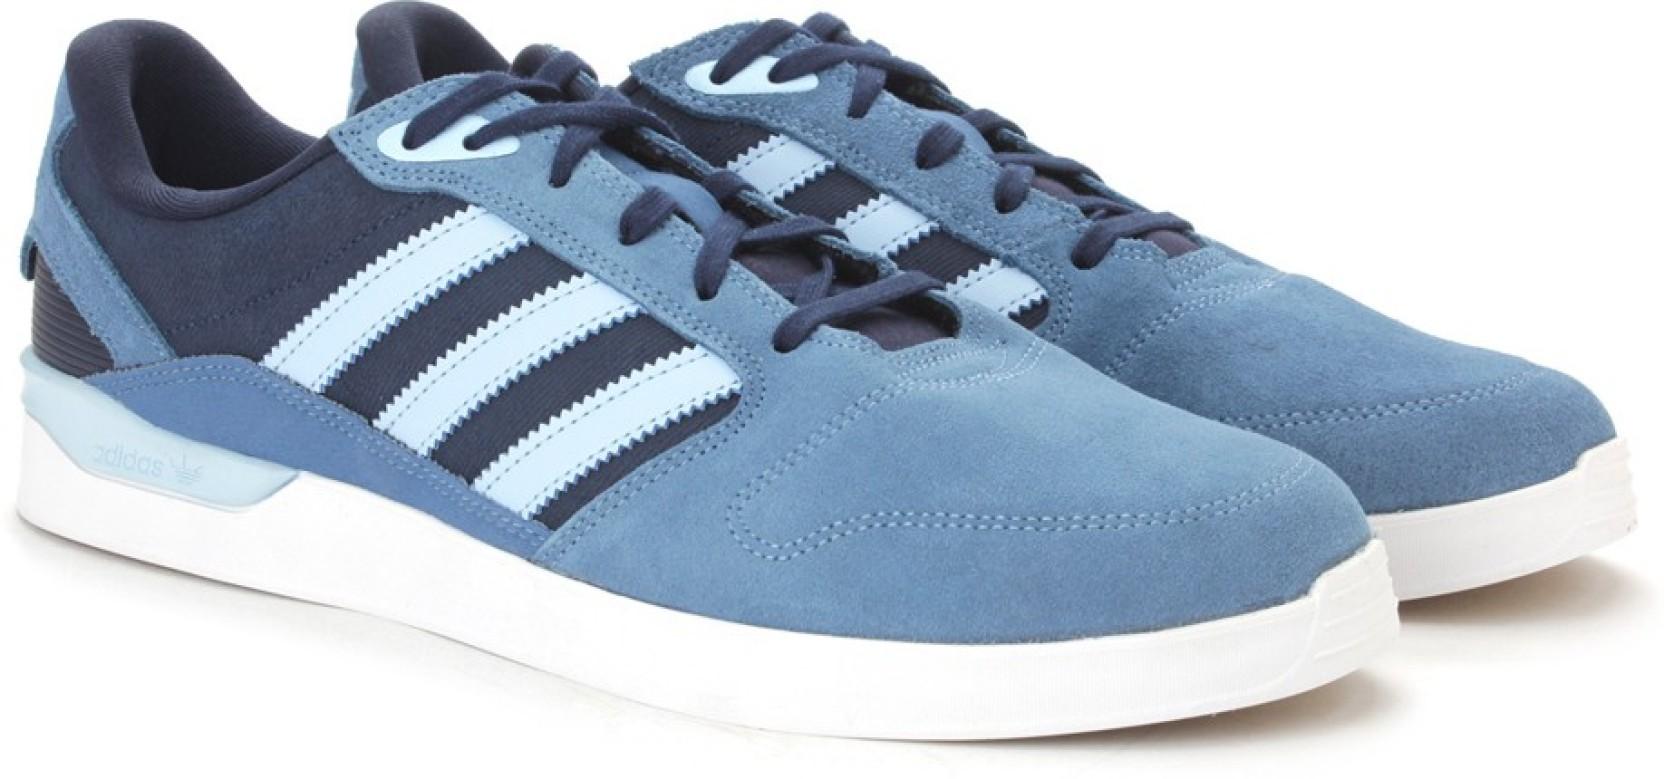 59facabd9 ADIDAS ZX VULC Men Running Shoes For Men - Buy ASHBLU CLESKY CONAVY ...